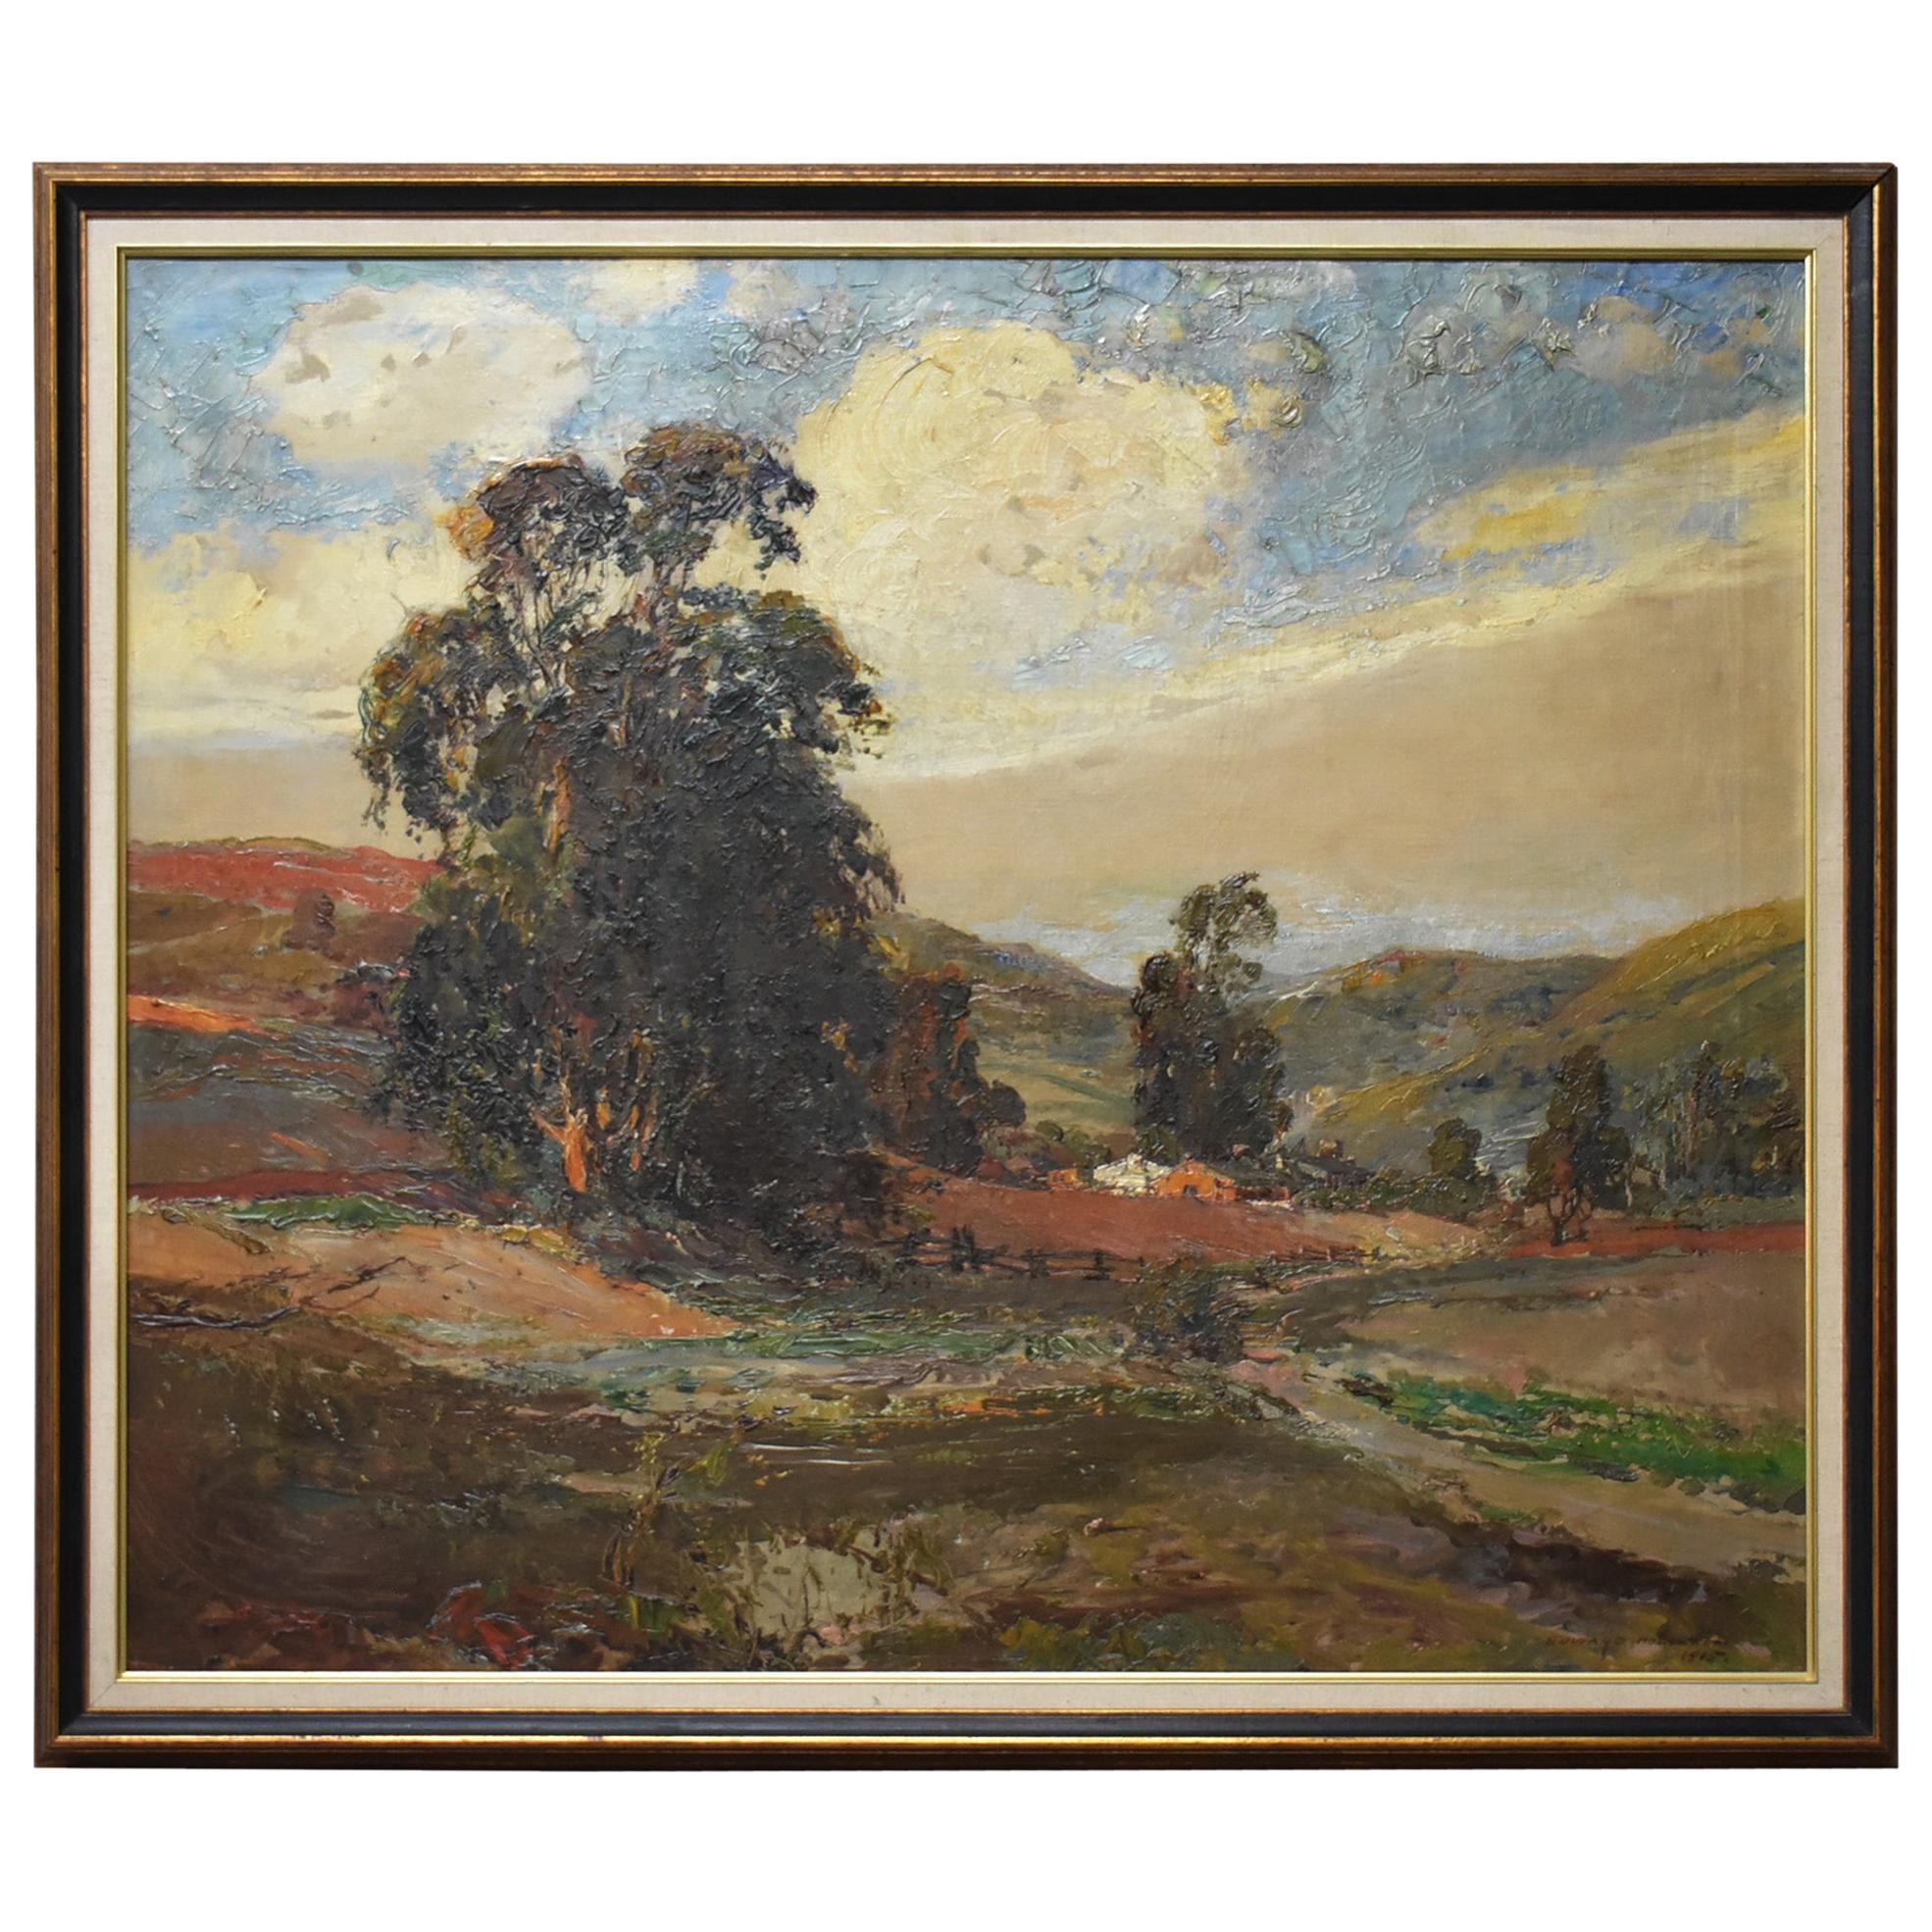 Original Oil On Canvas California Artist Edward Holslag Landscape Countryside